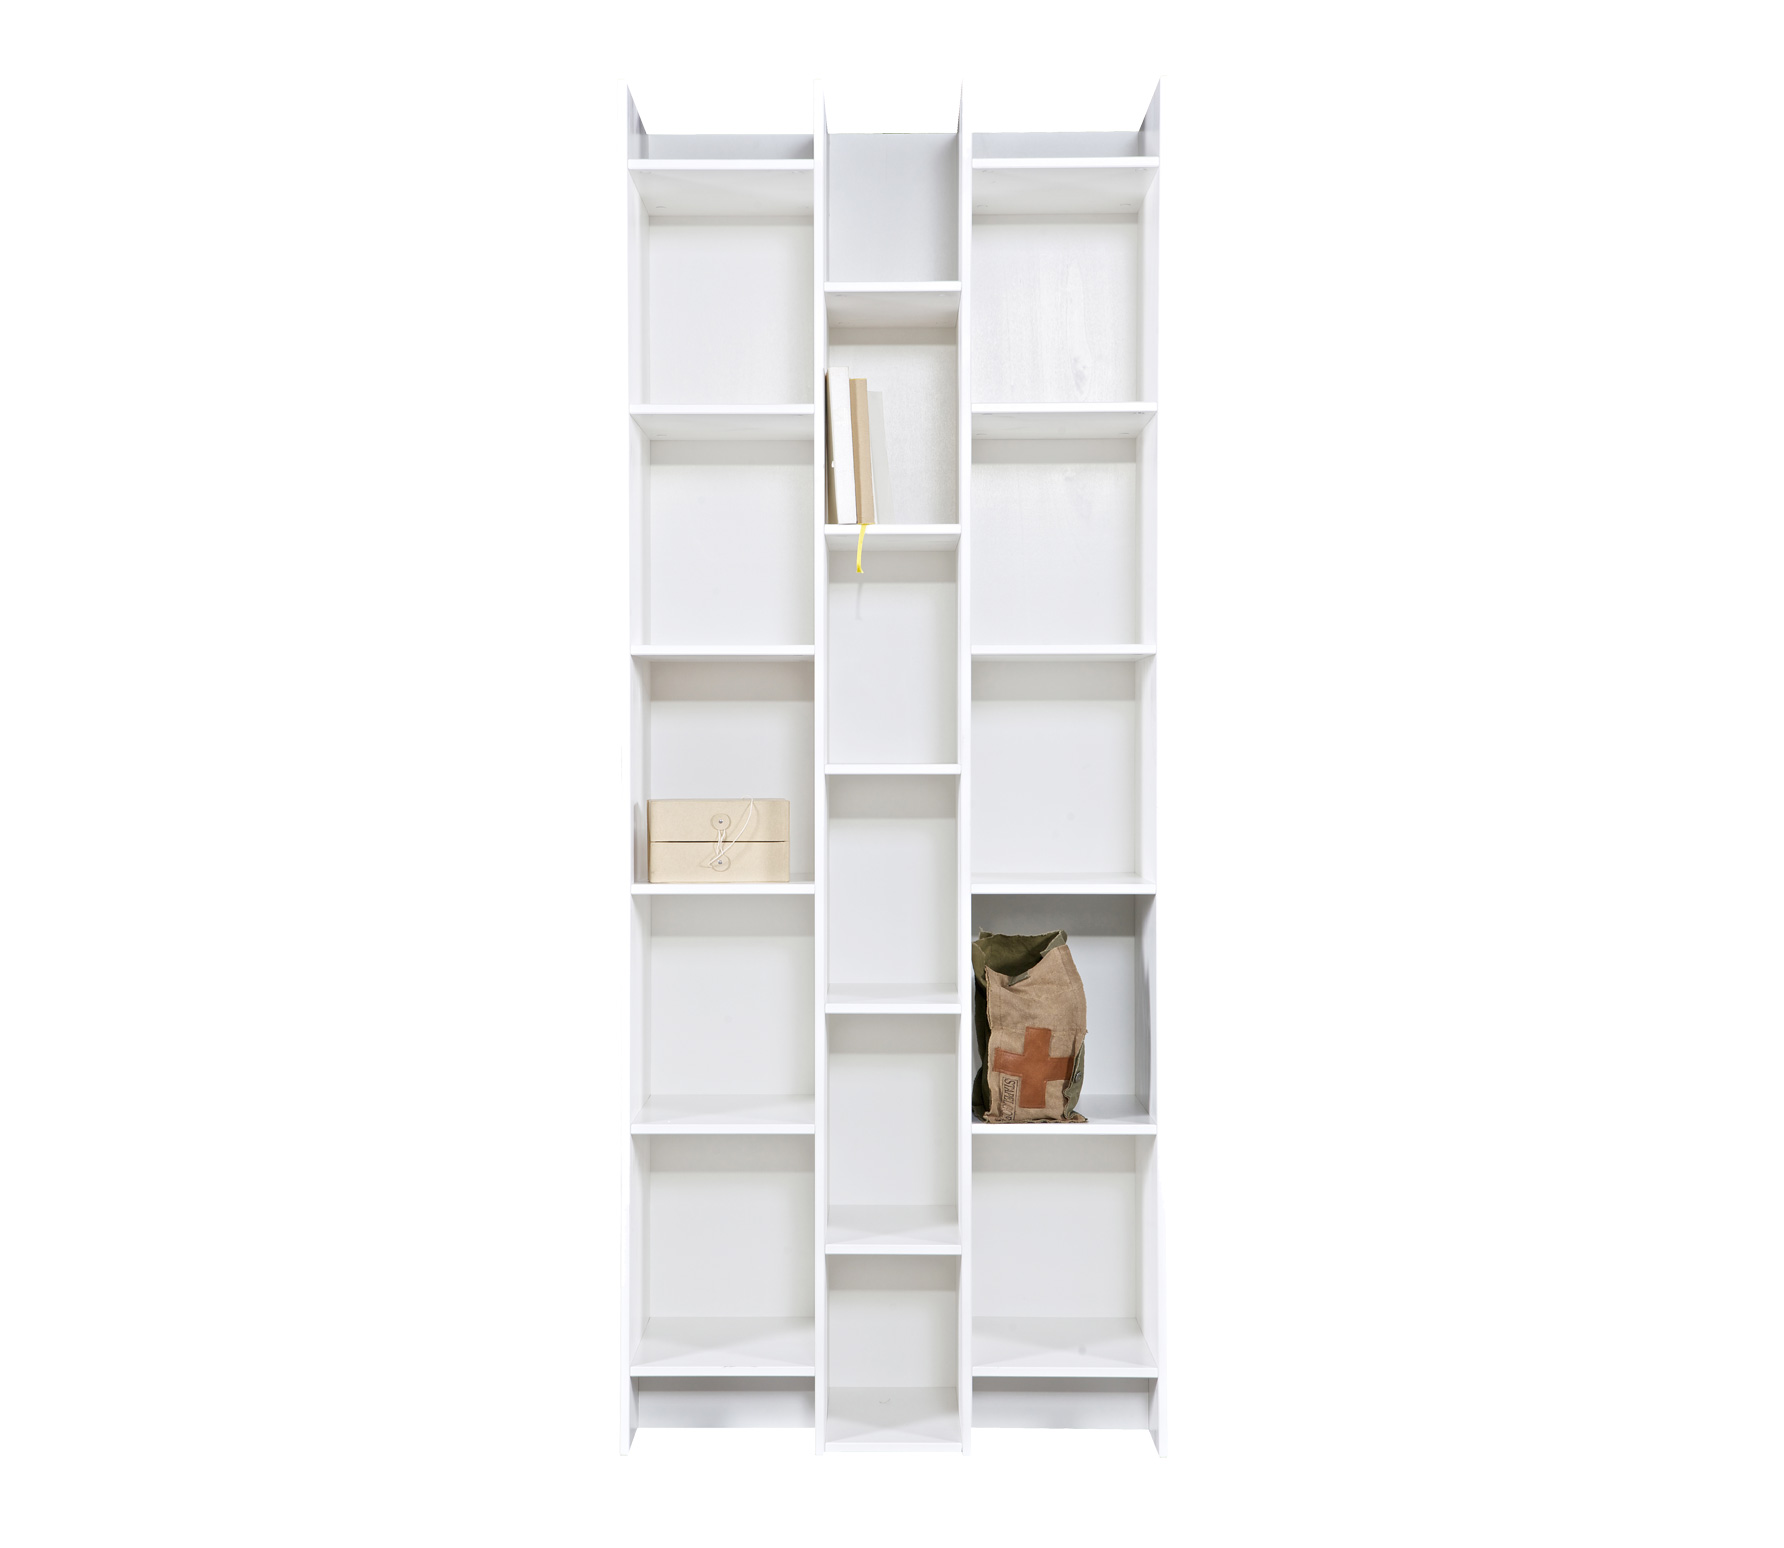 woood expand boekenkast vakkenkast 200x80x35 cm grenen wit